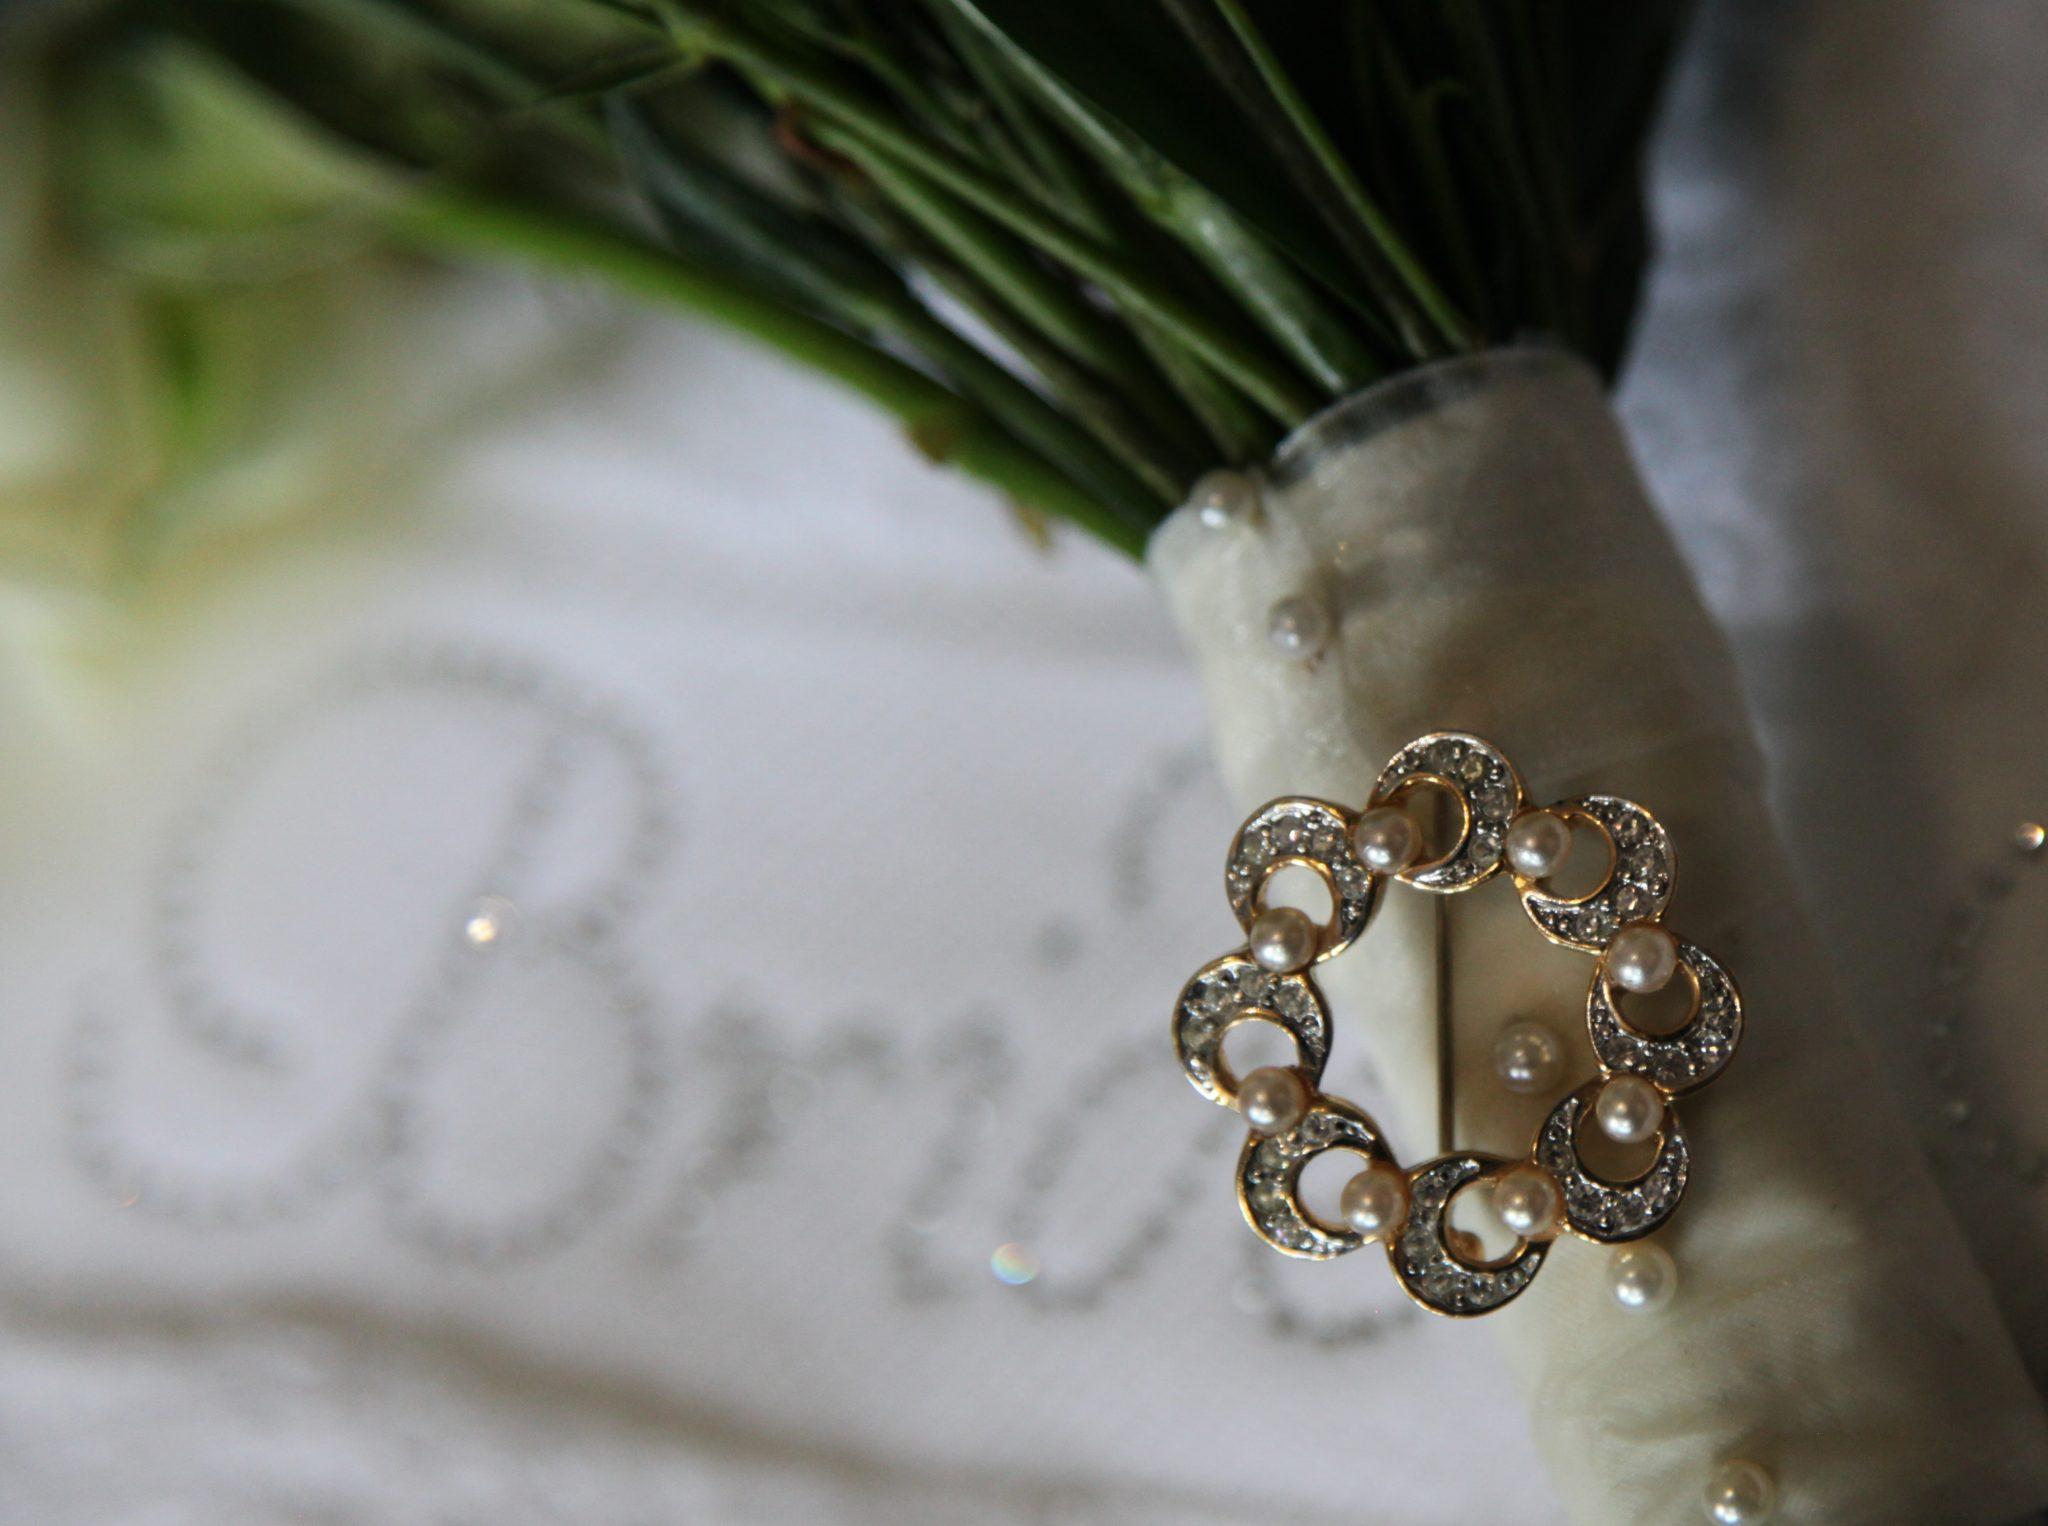 Wedding, Something Old, Grandma's brooch